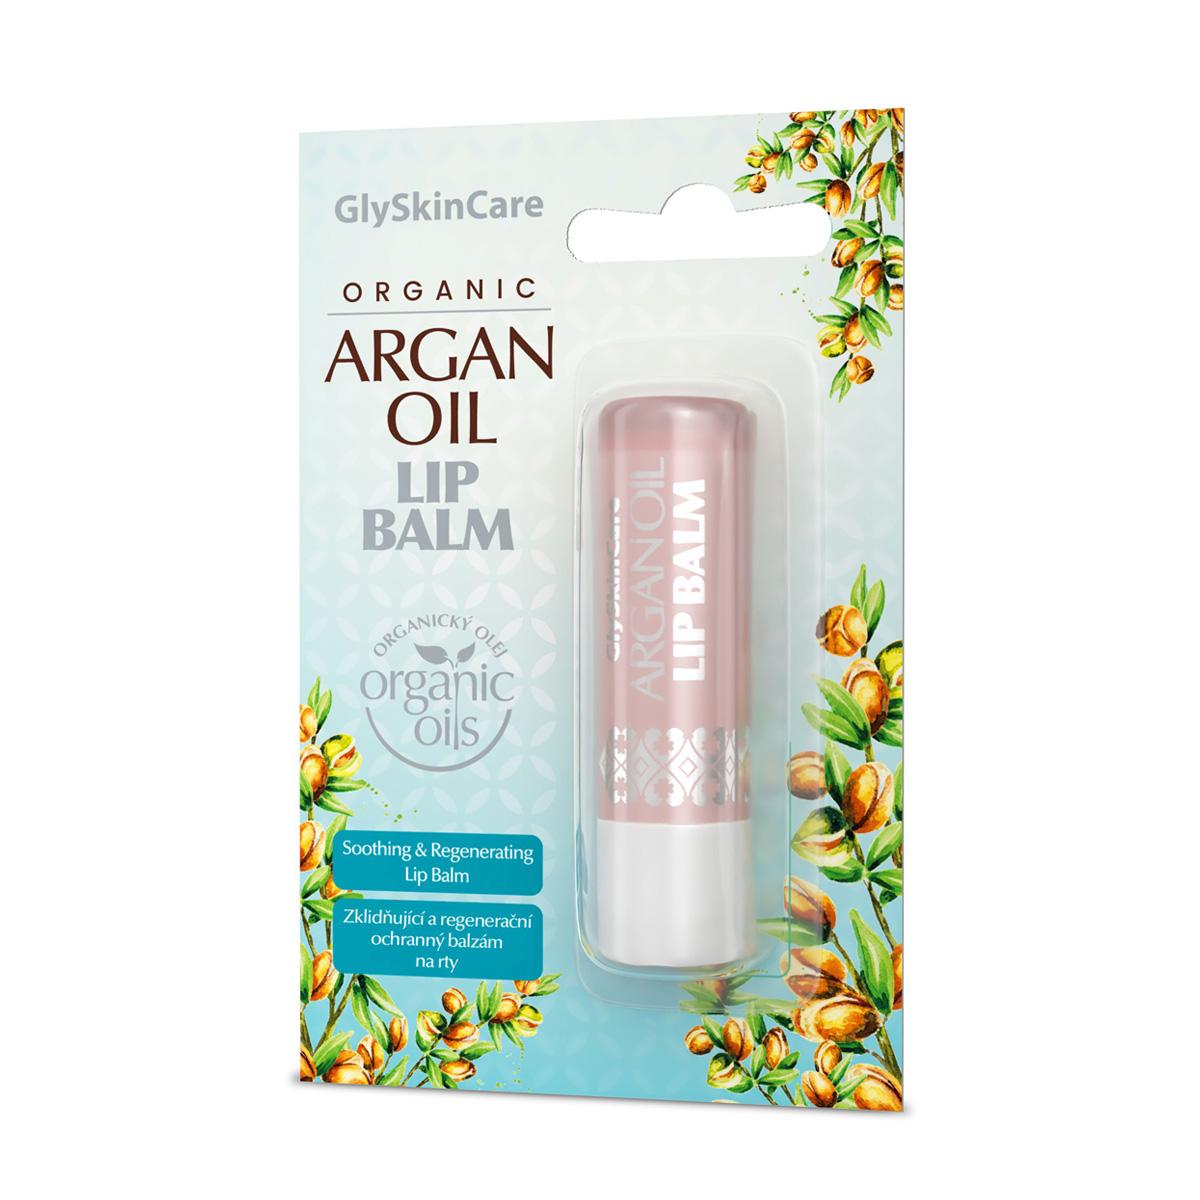 Biotter Balzám Argan Oil Lip Balm 4,9 g